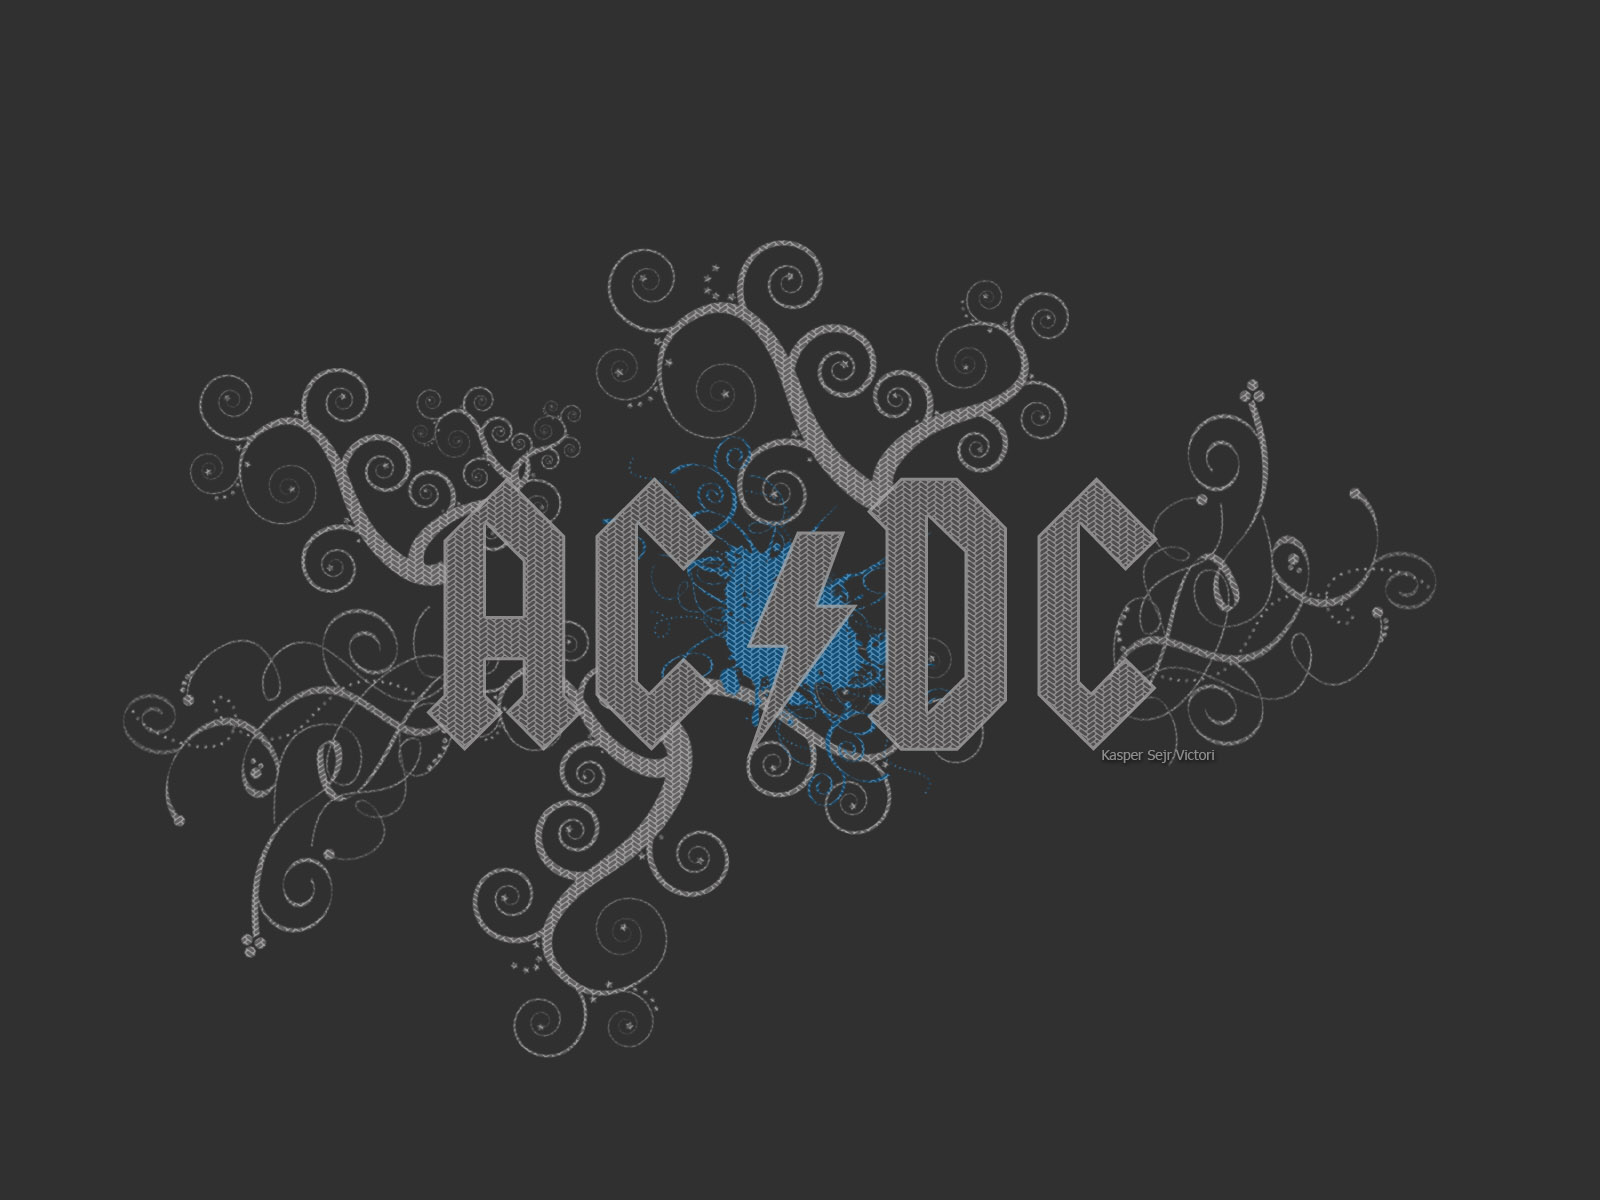 Fondos De Escritorio Hd Dc: AC DC Logo Wallpapers